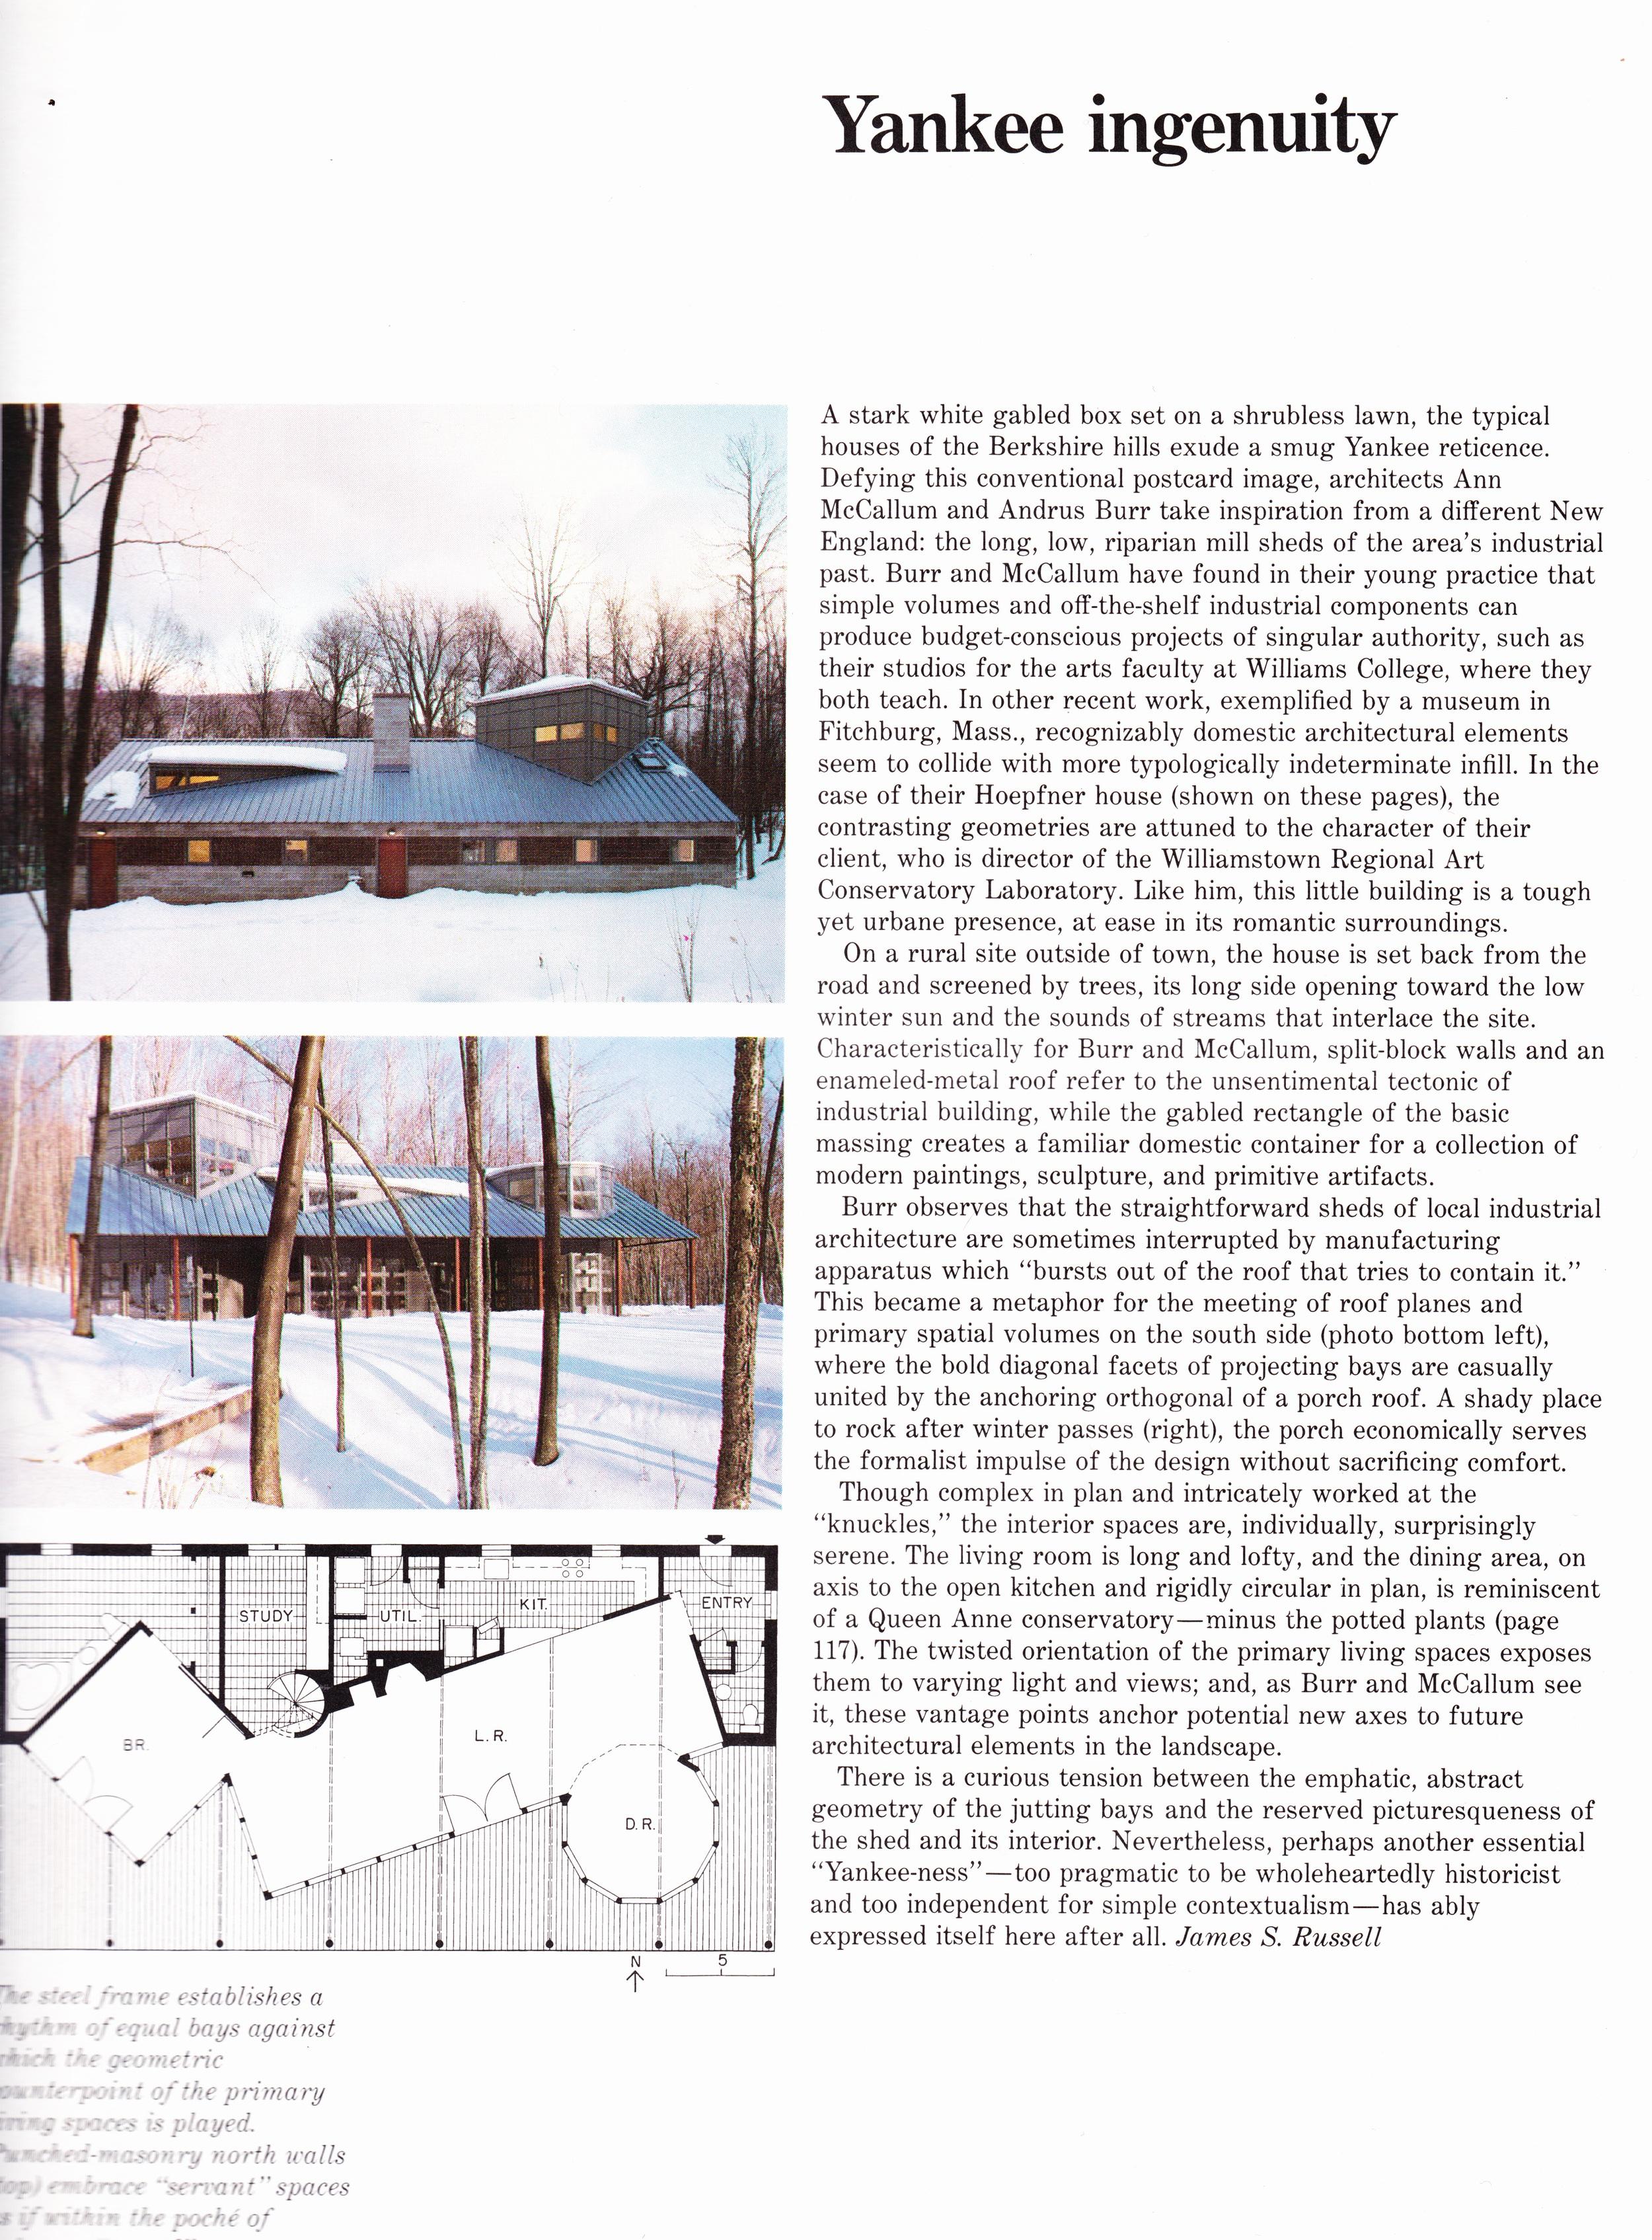 Arch Record Yankee Ingenuity_0002.jpg